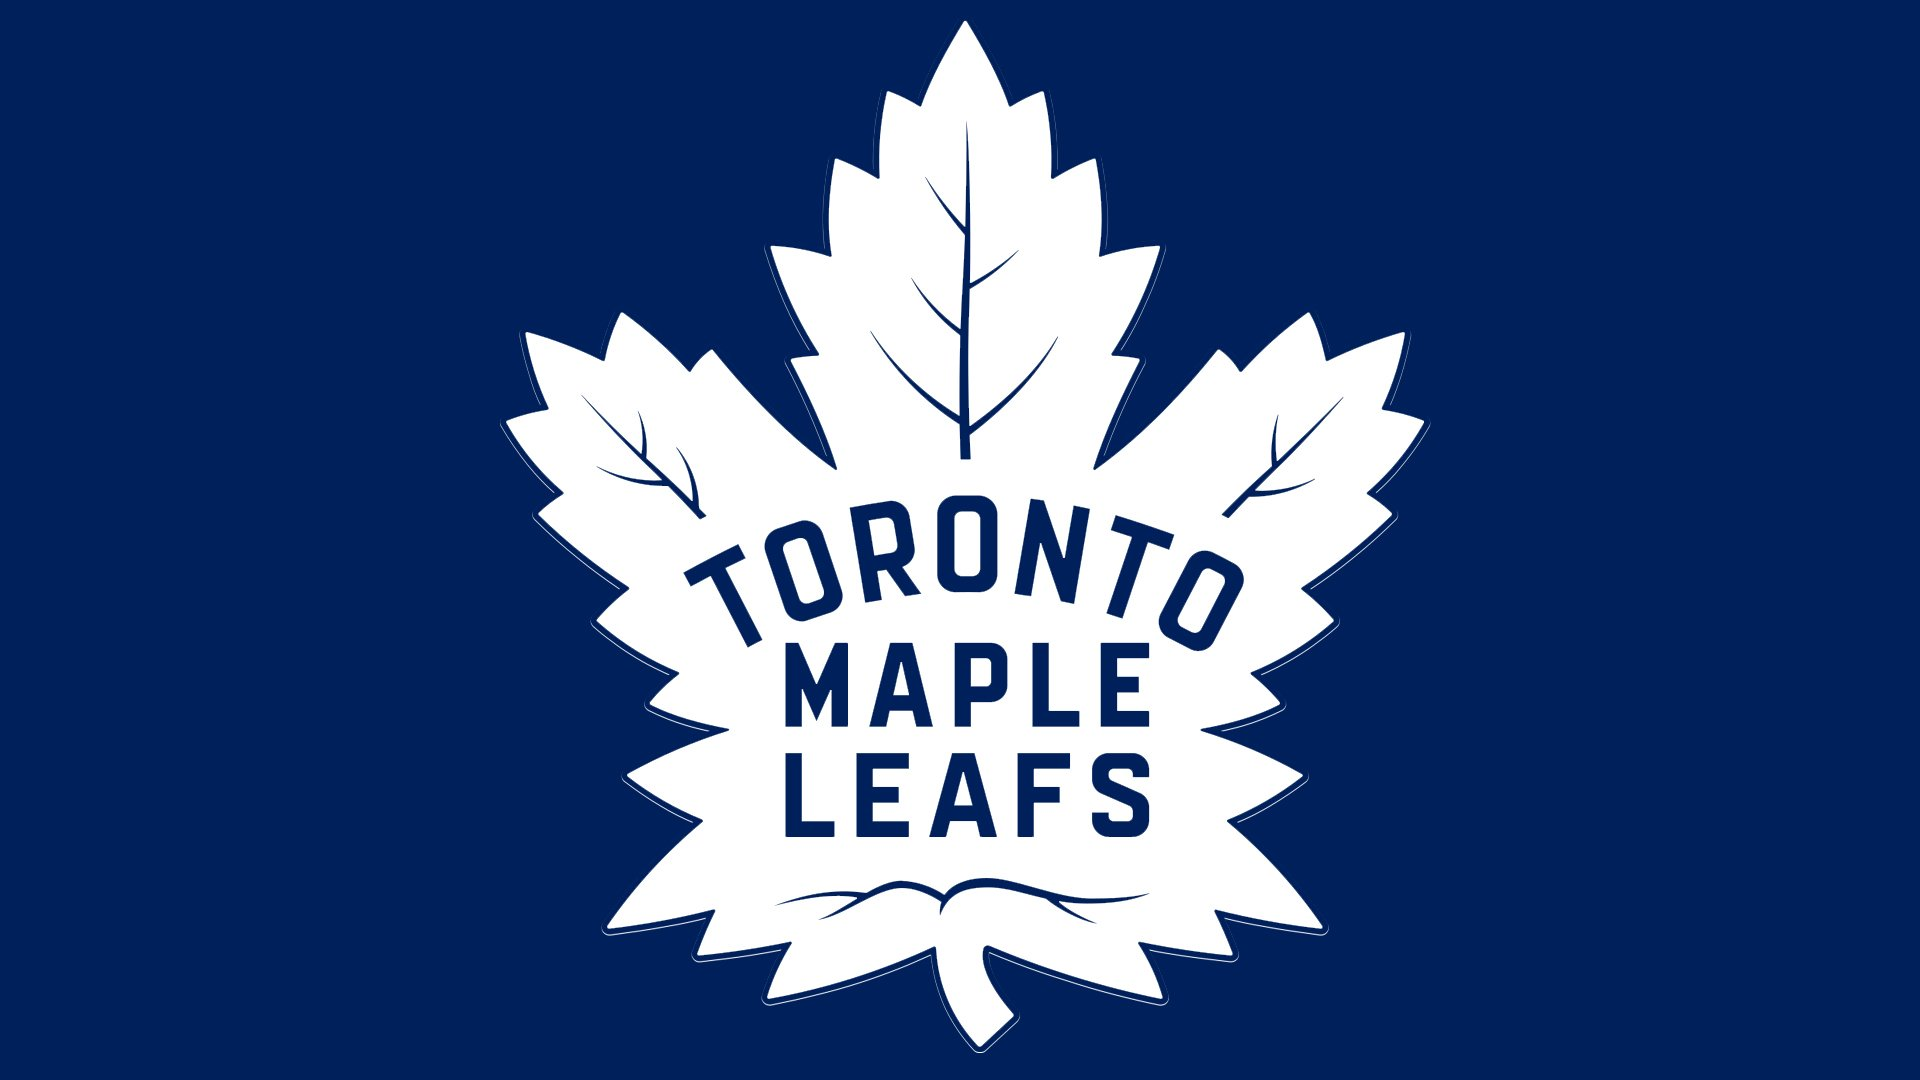 Toronto Maple Leafs Logo Toronto Maple Leafs Symbol